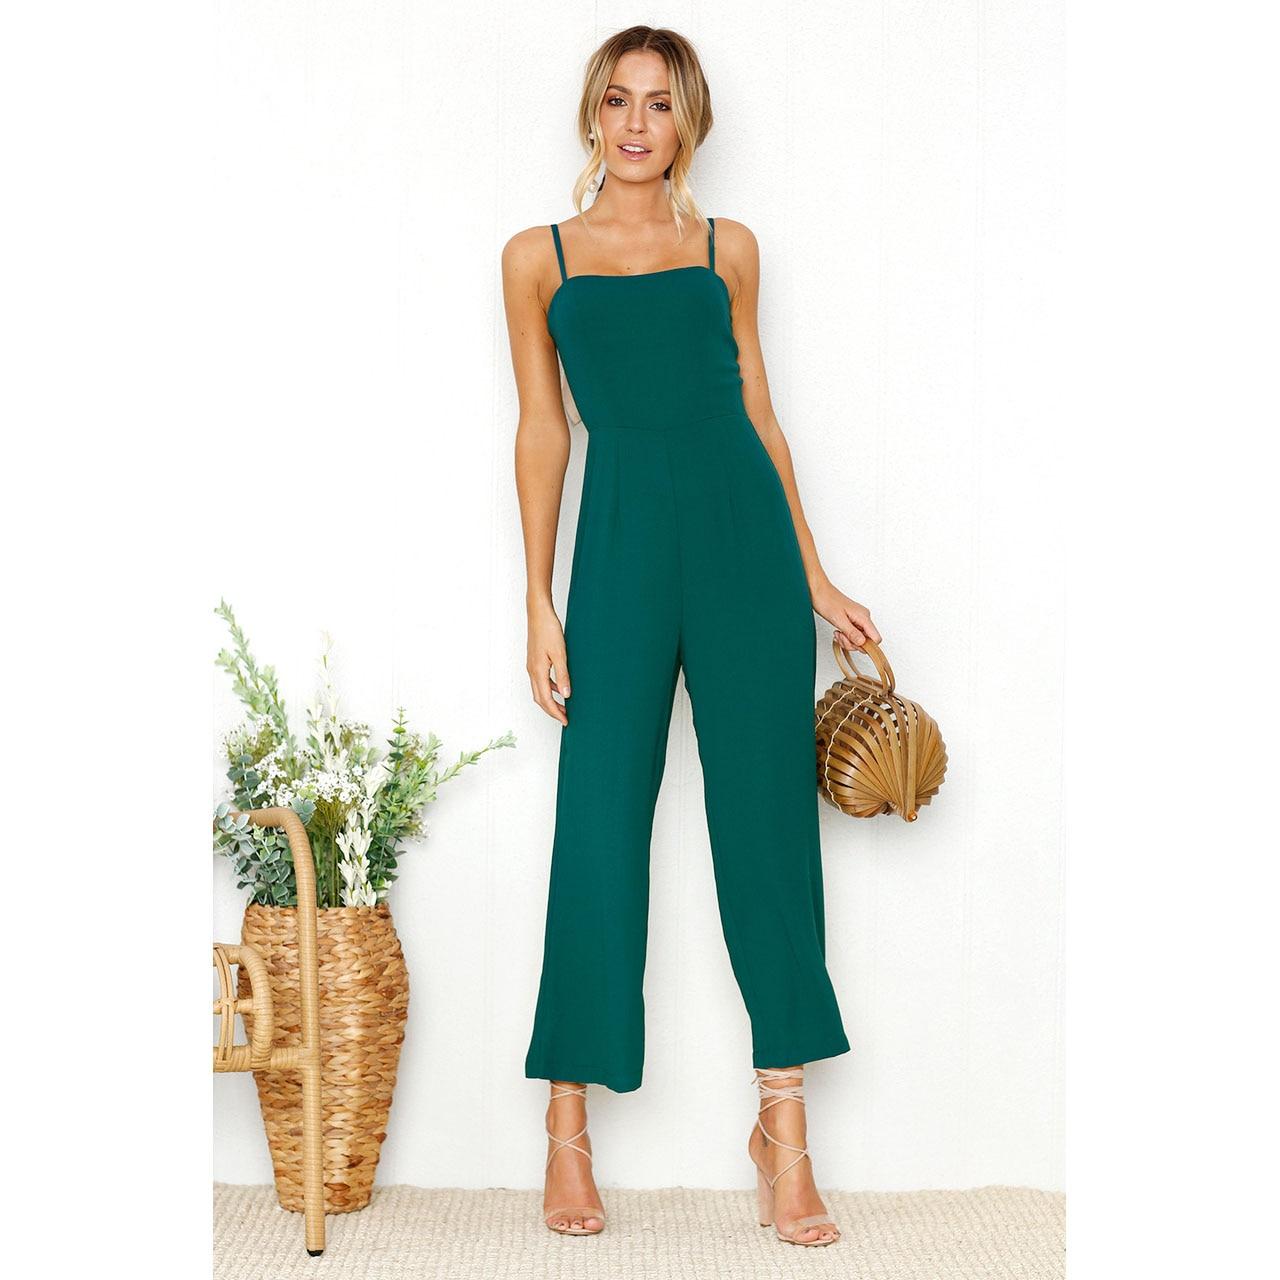 Casual   Jumpsuit   Women Spaghetti Strap Overalls Sleeveless Elegant Straight   Jumpsuits   Long Pants 2018 Summer Fashion Suit